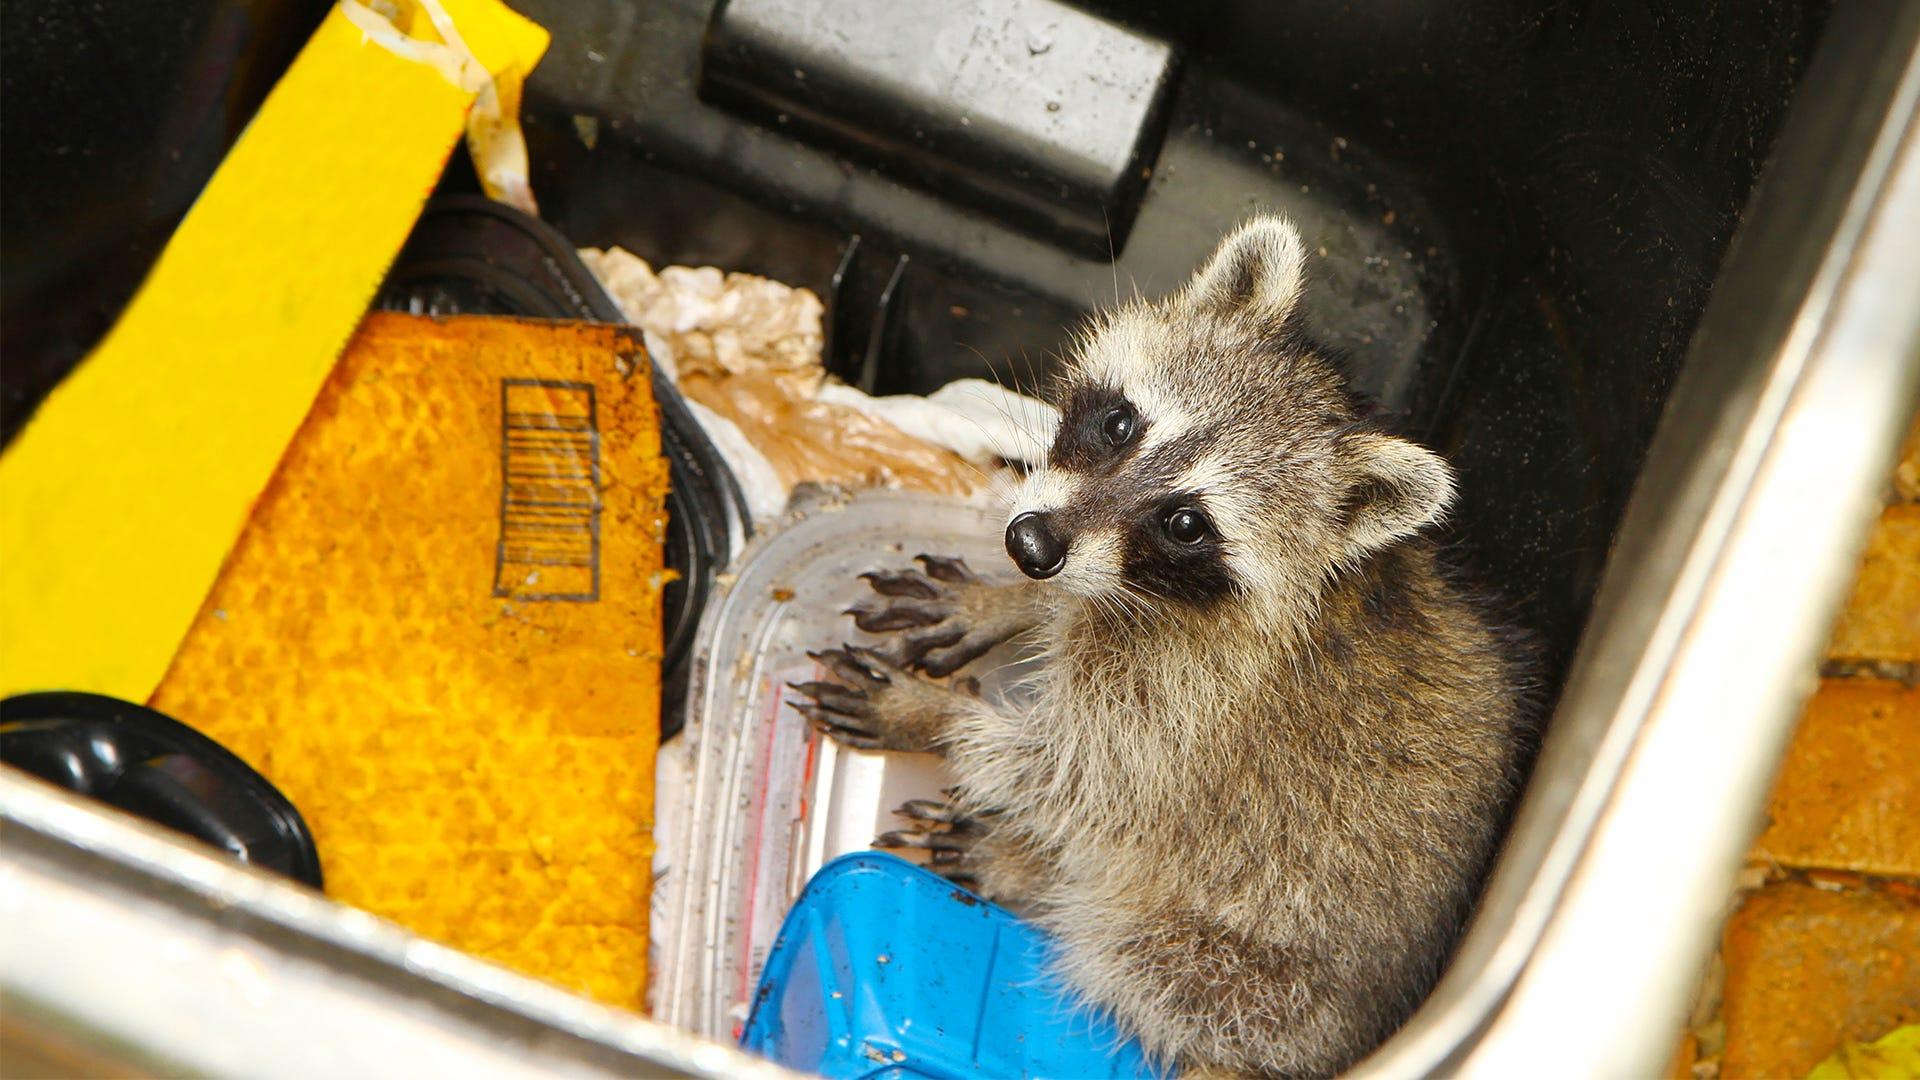 Where Do Raccoons Live?